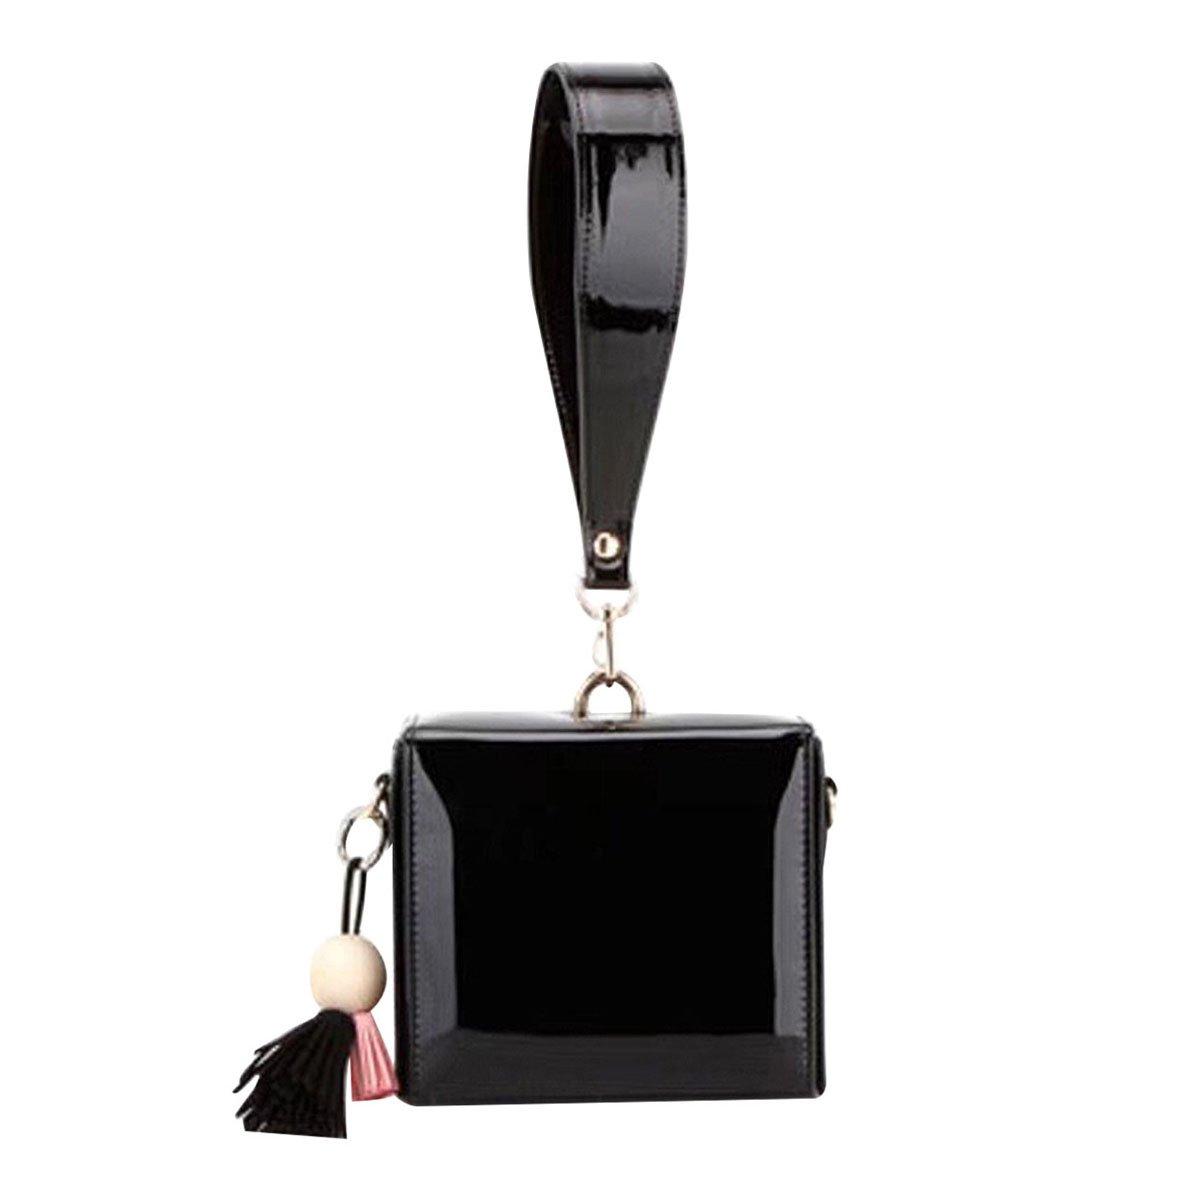 Heidi Bag Designer Tote Purse Patent Shoulder Top Handle Handbags Box Candy Clutch